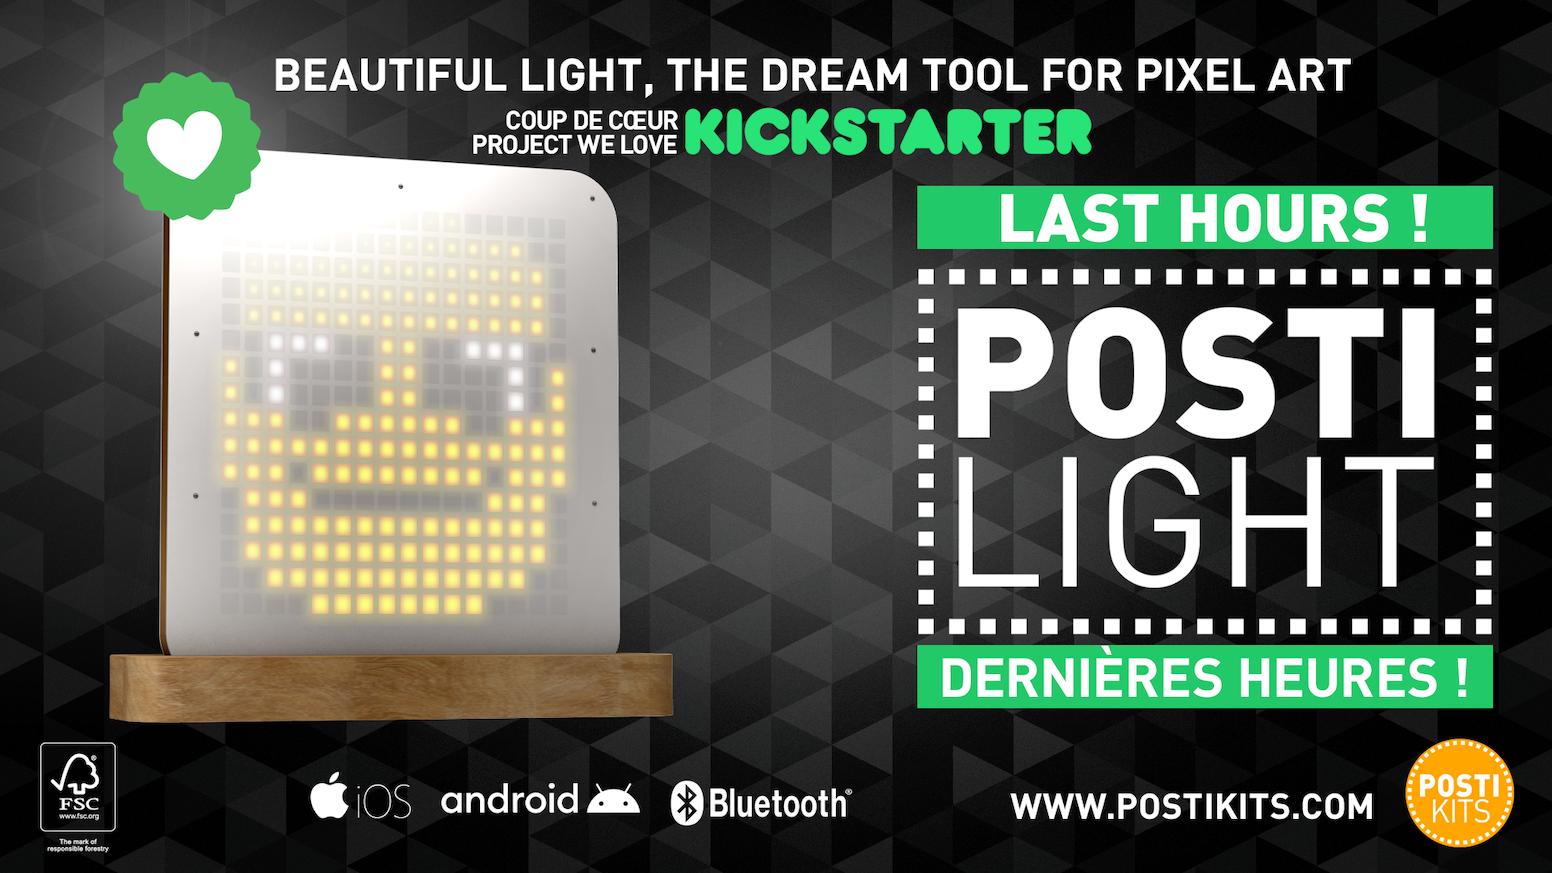 Monter Une Lampe De Chevet posti lightposti kits — kickstarter